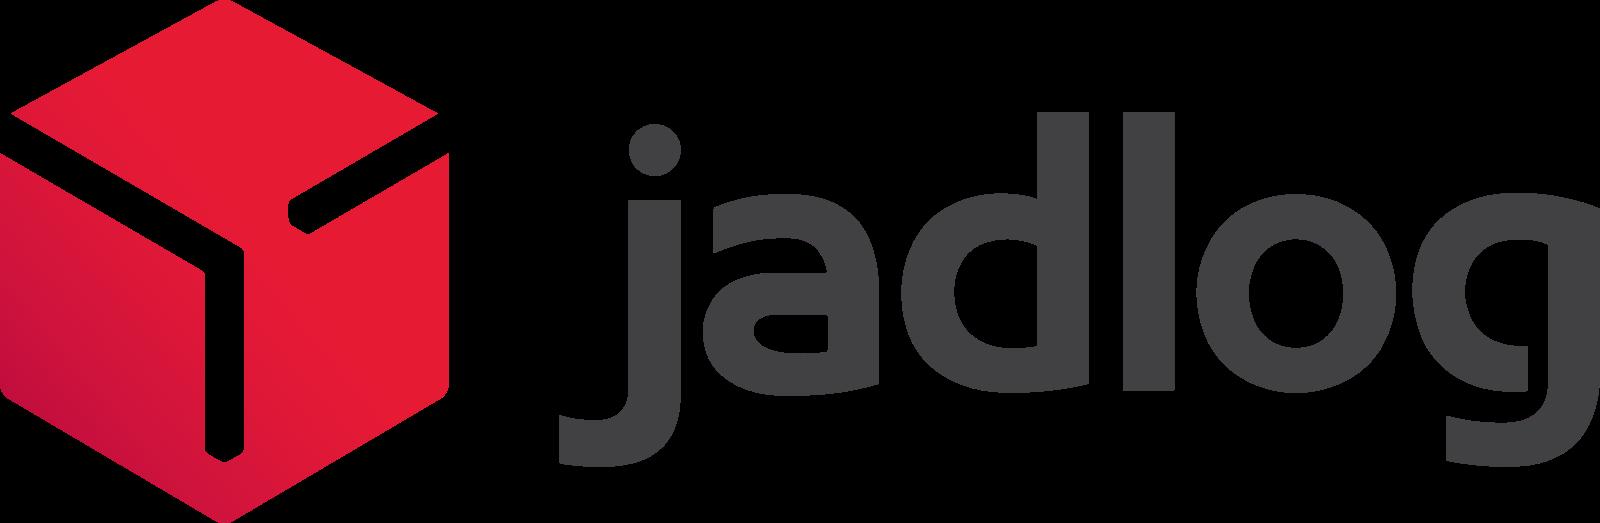 jadlog logo.